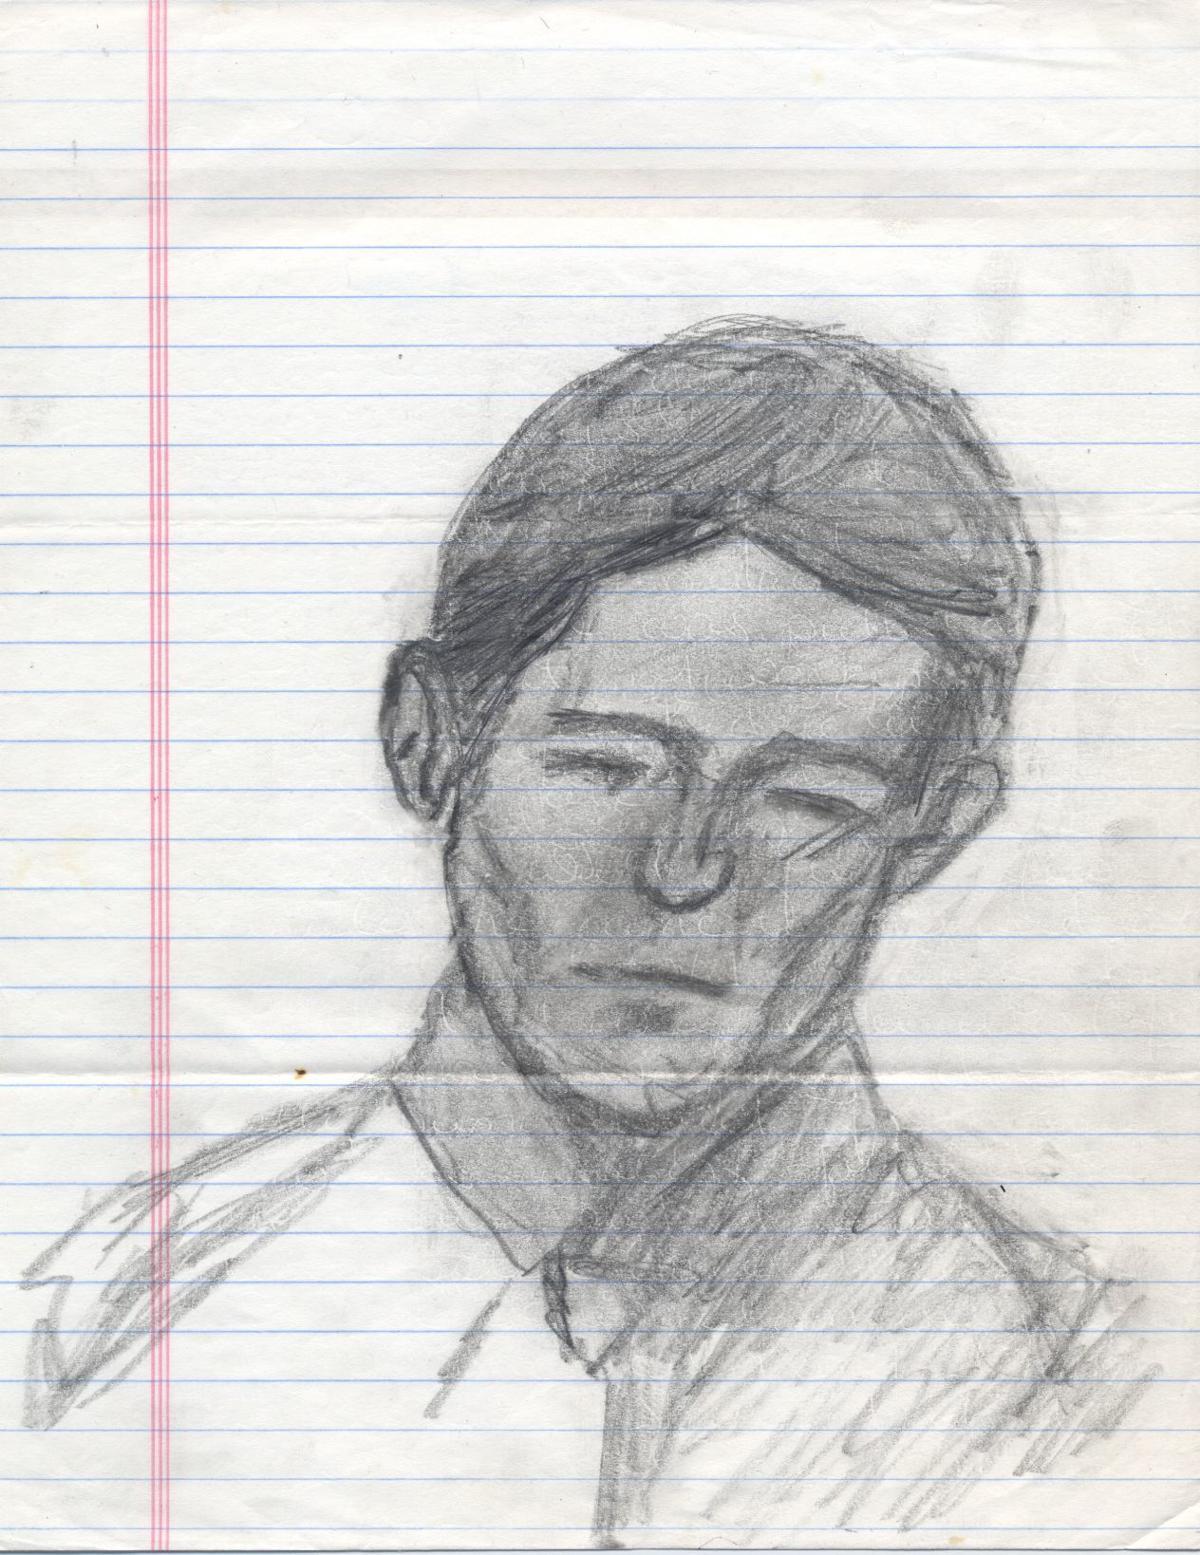 Ricky Drawing 01